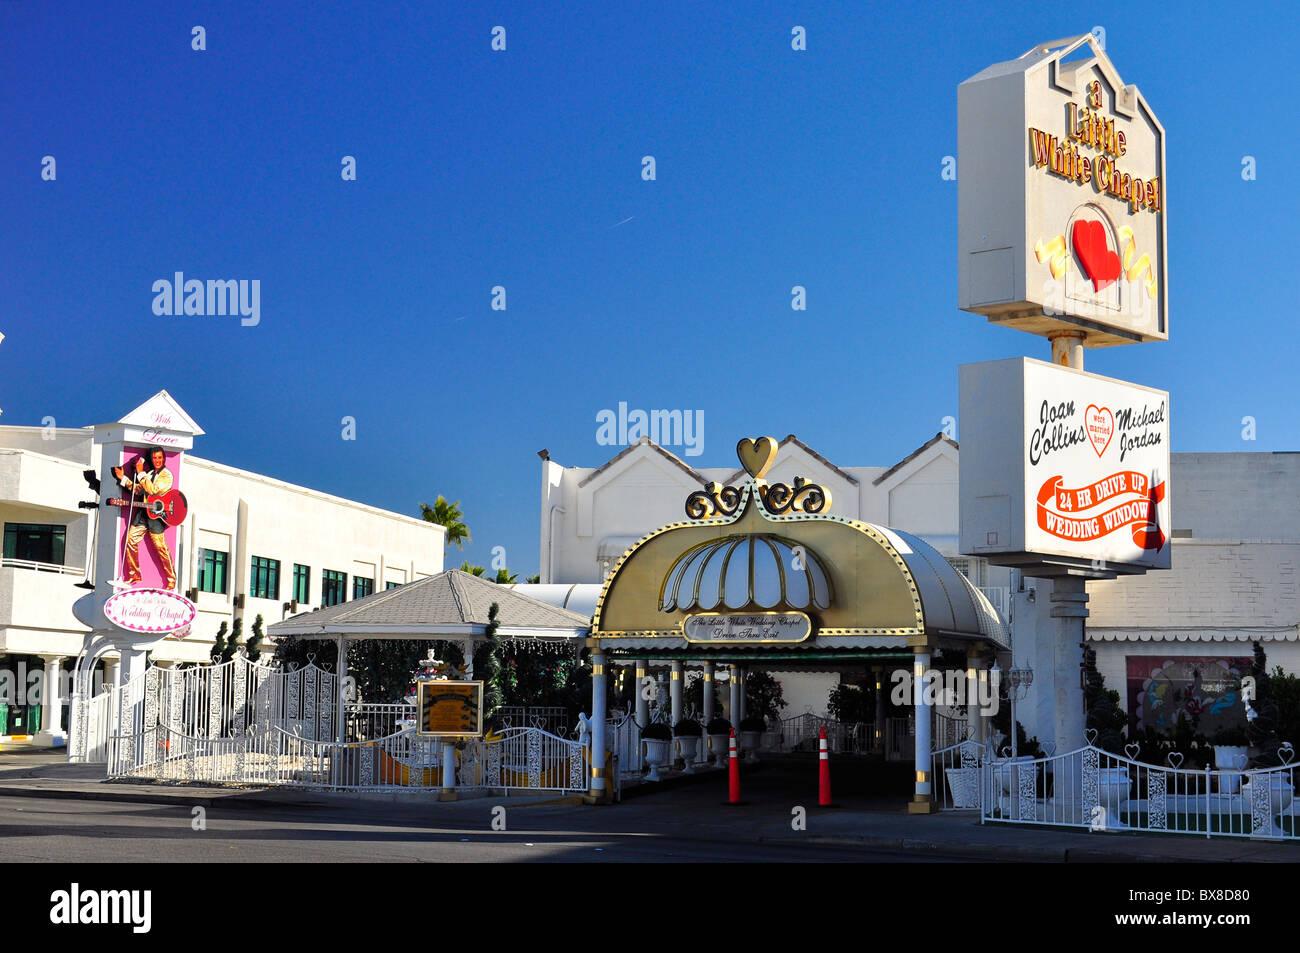 Drive Through Wedding Chapel In Las Vegas Nevada Usa